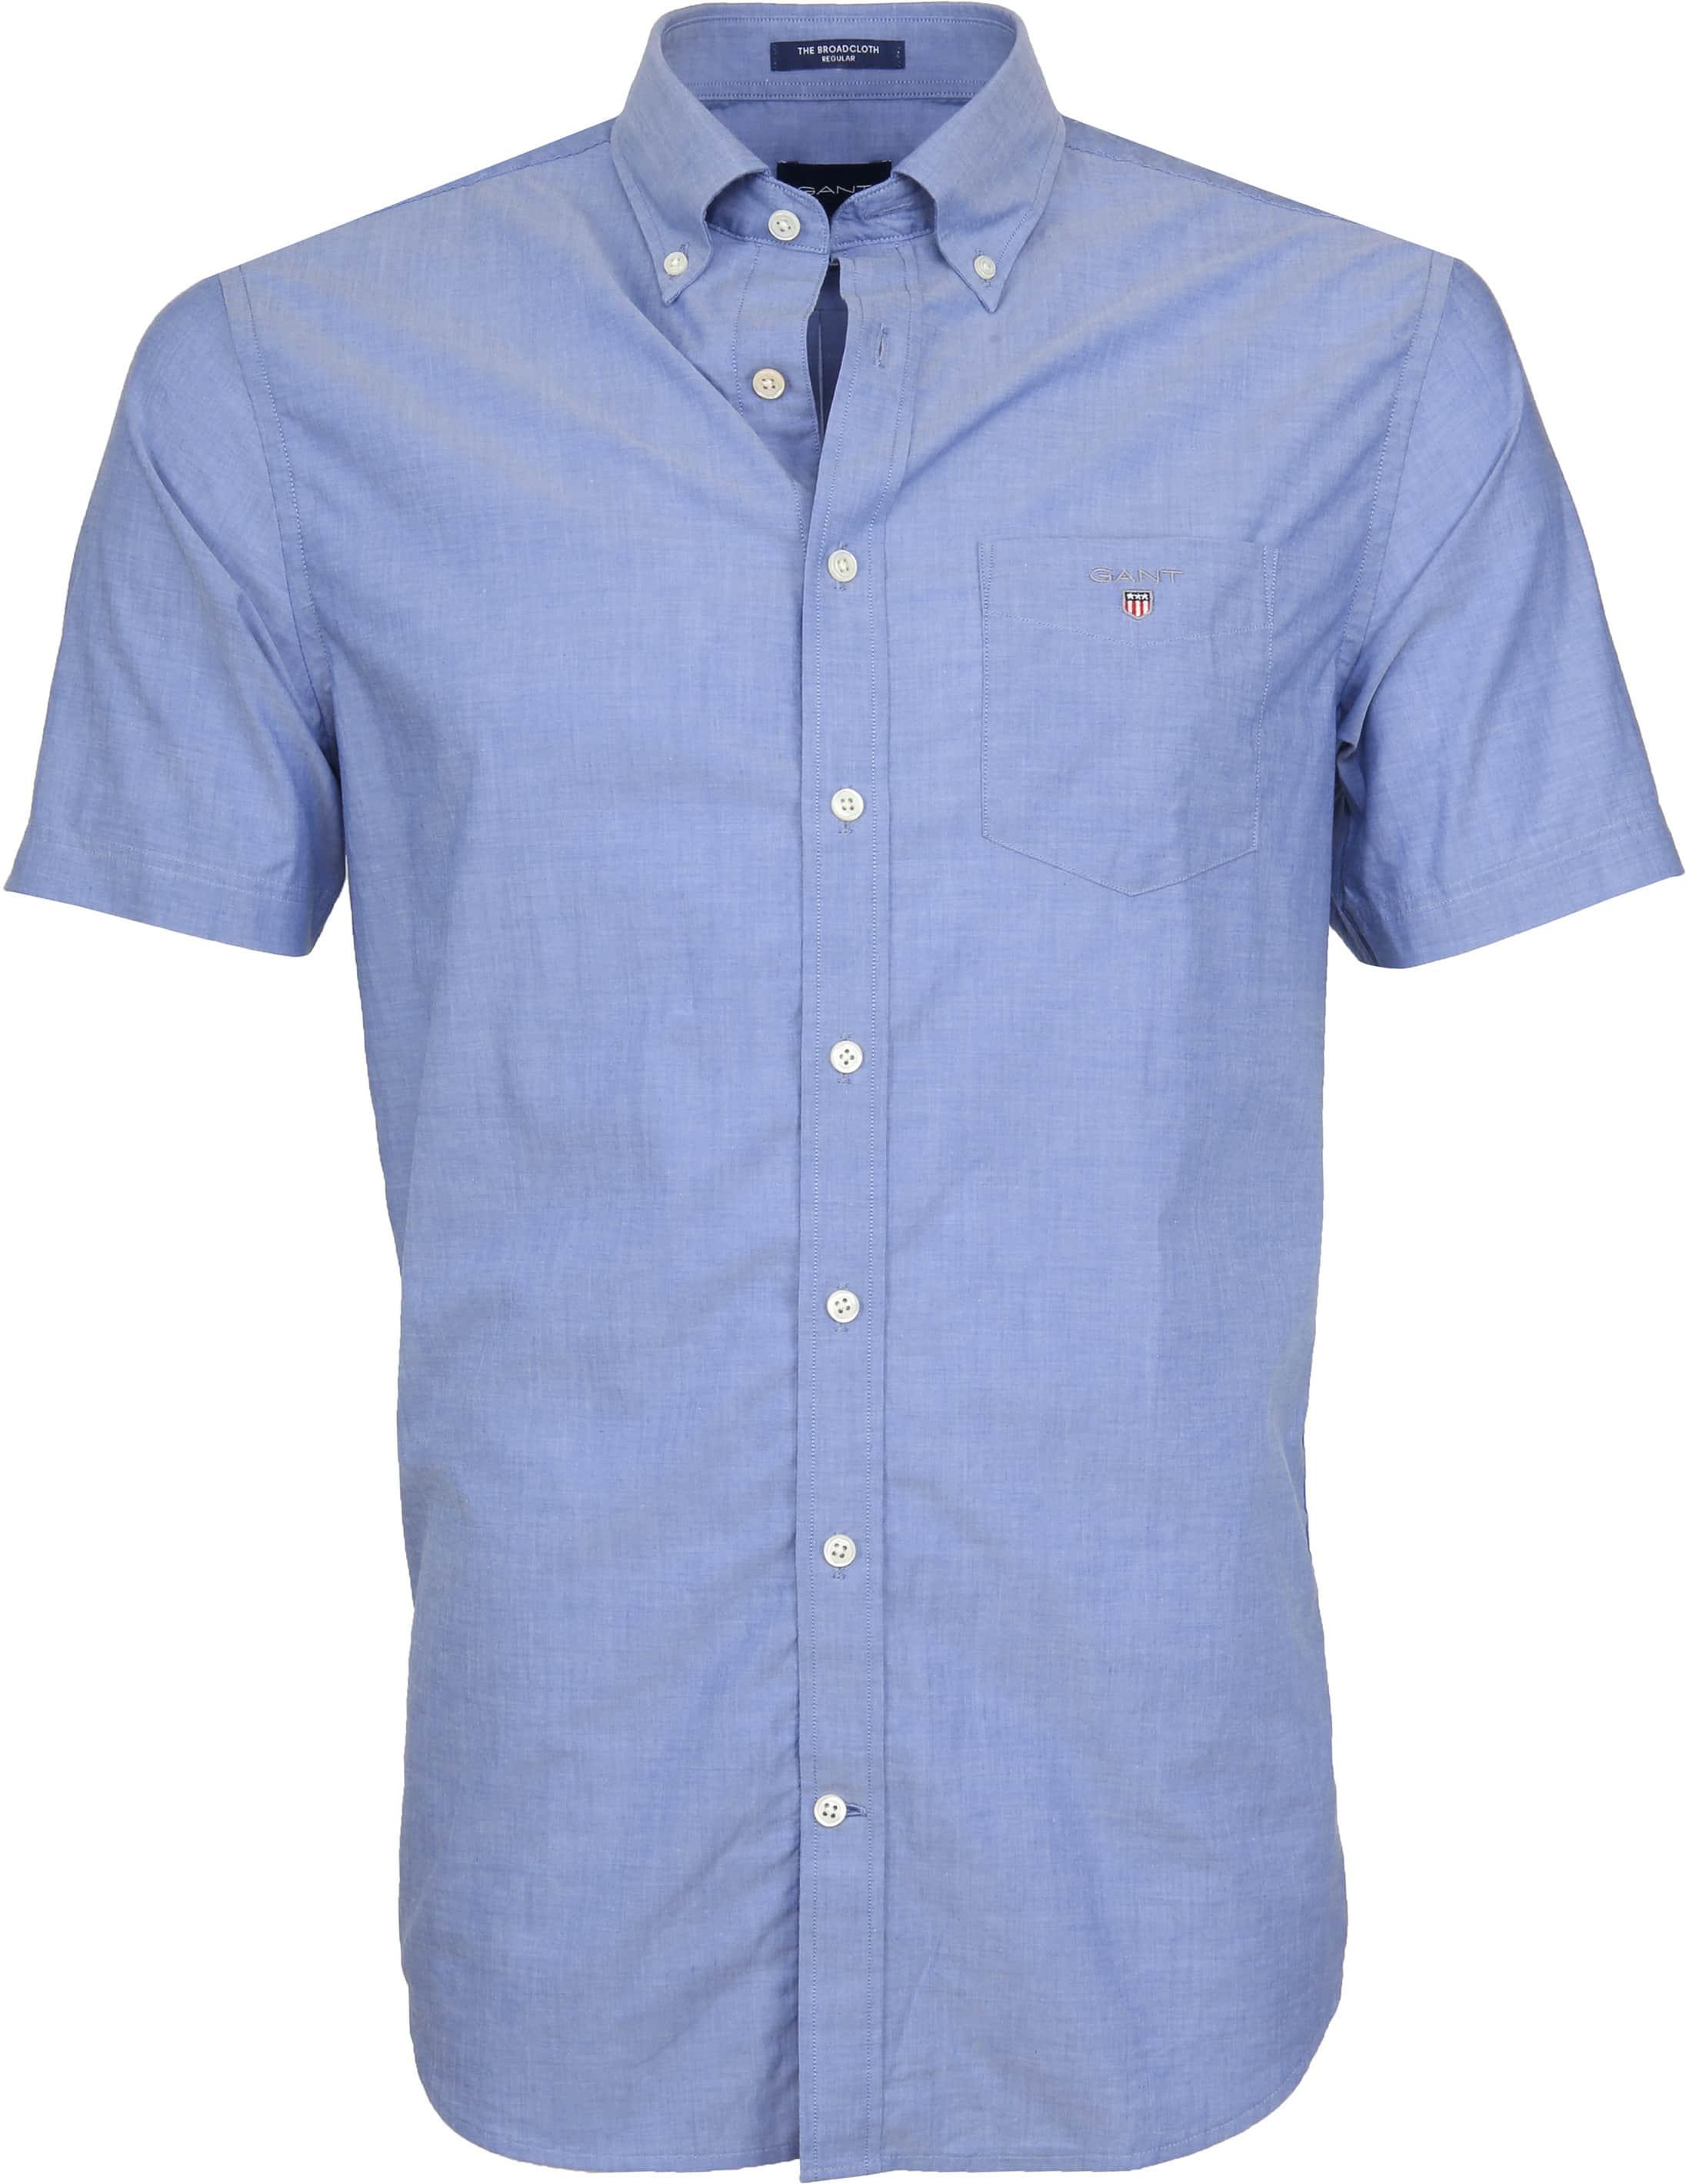 Gant Overhemd SS Broadcloth Blauw foto 0